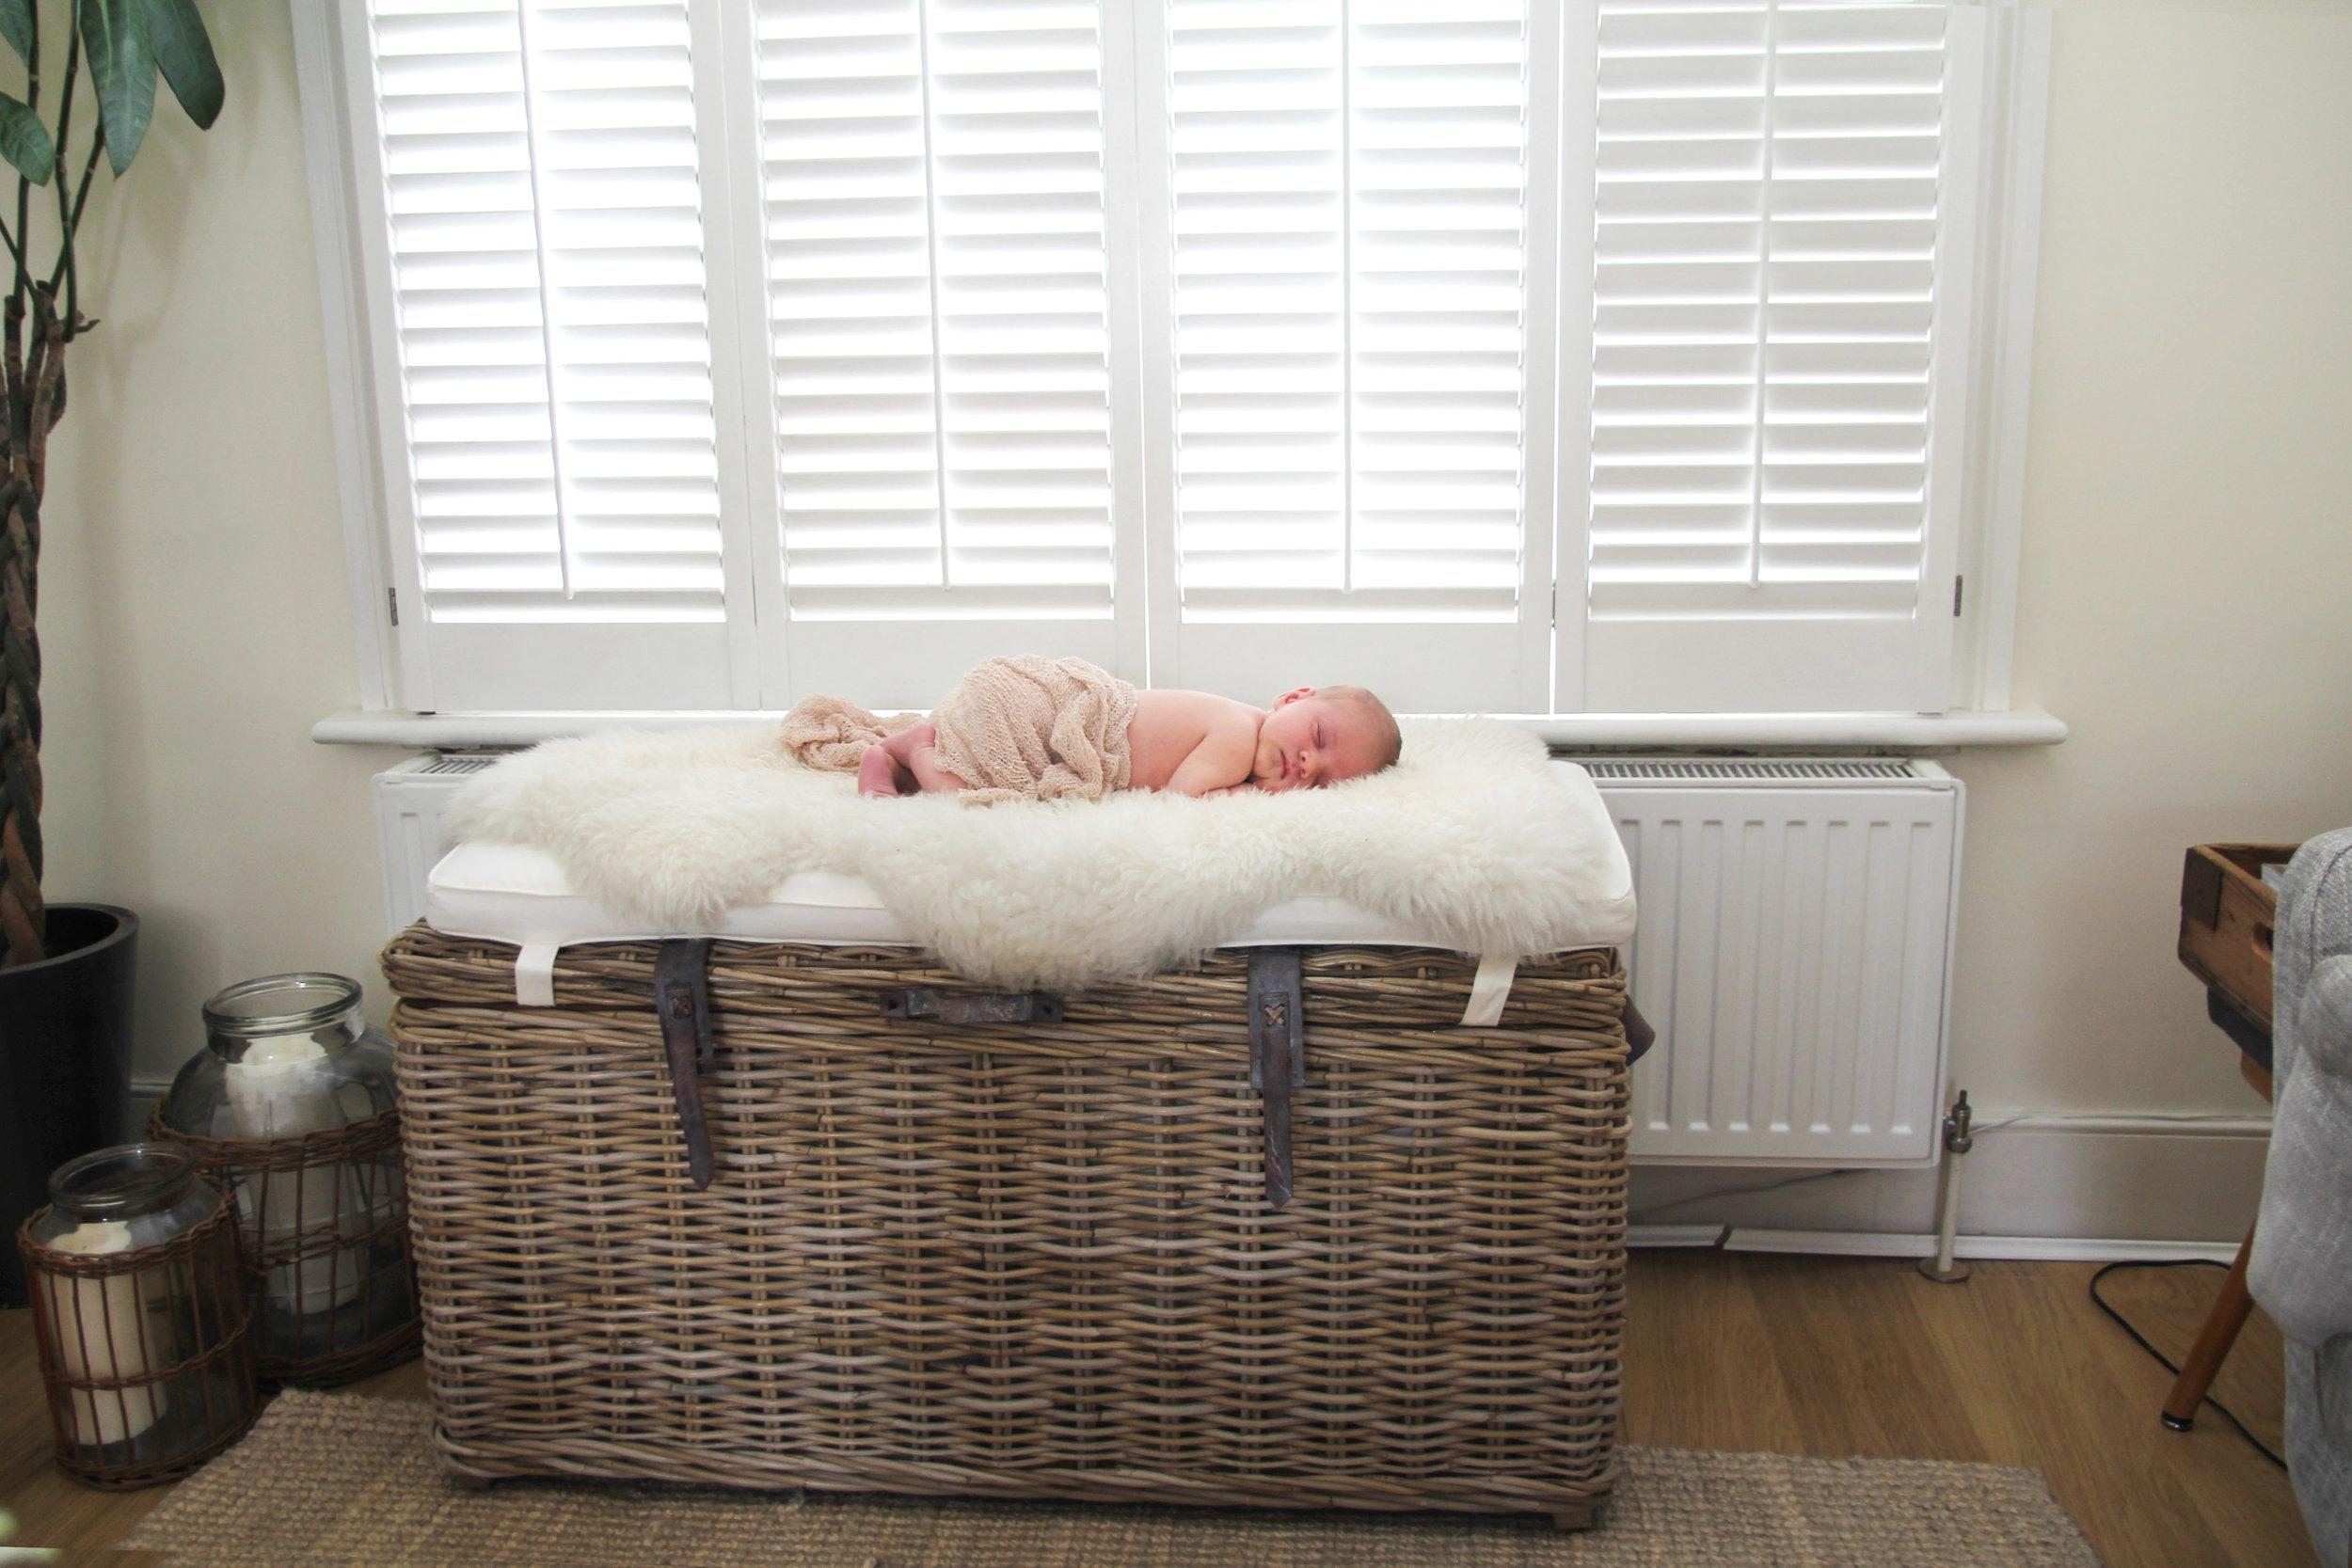 Lifestyle newborn photography, berkshire, london, surrey